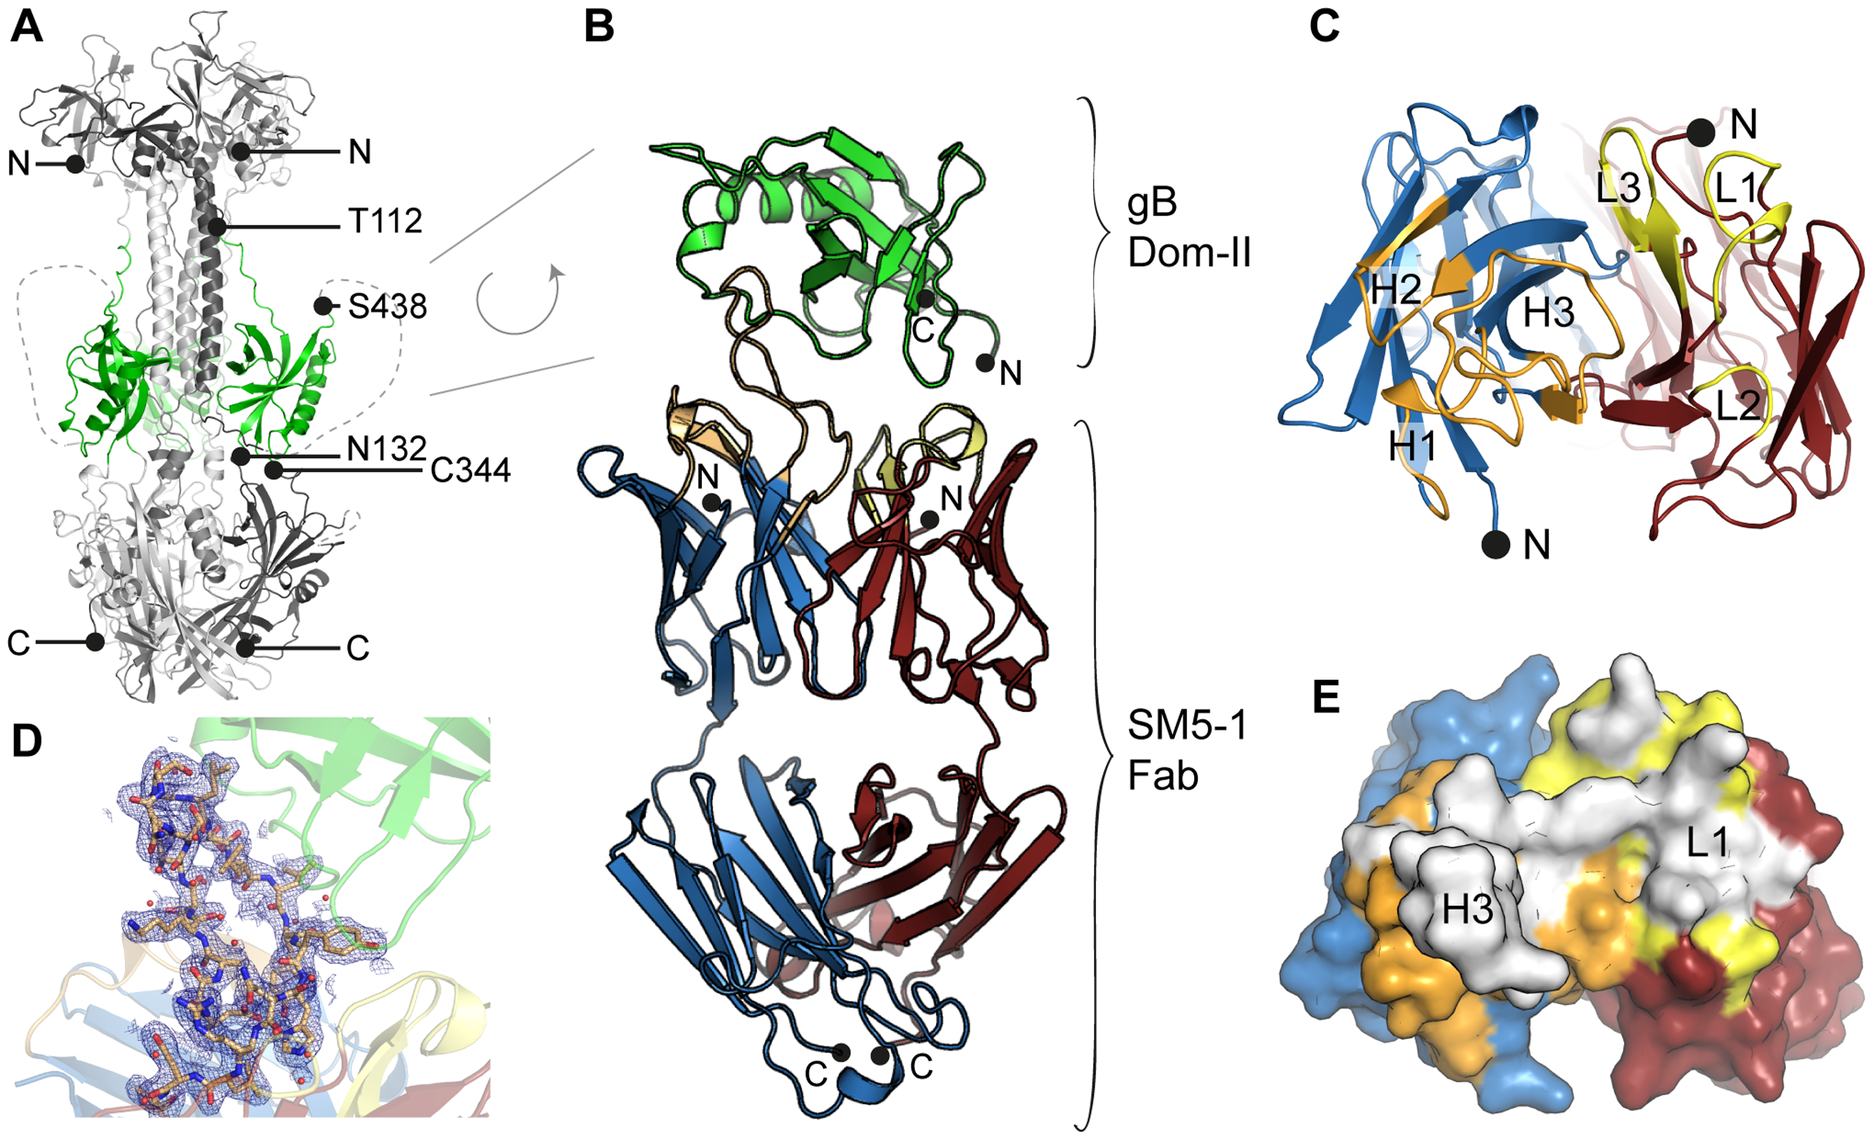 HCMV gB Dom-II recognition by antibody SM5-1.